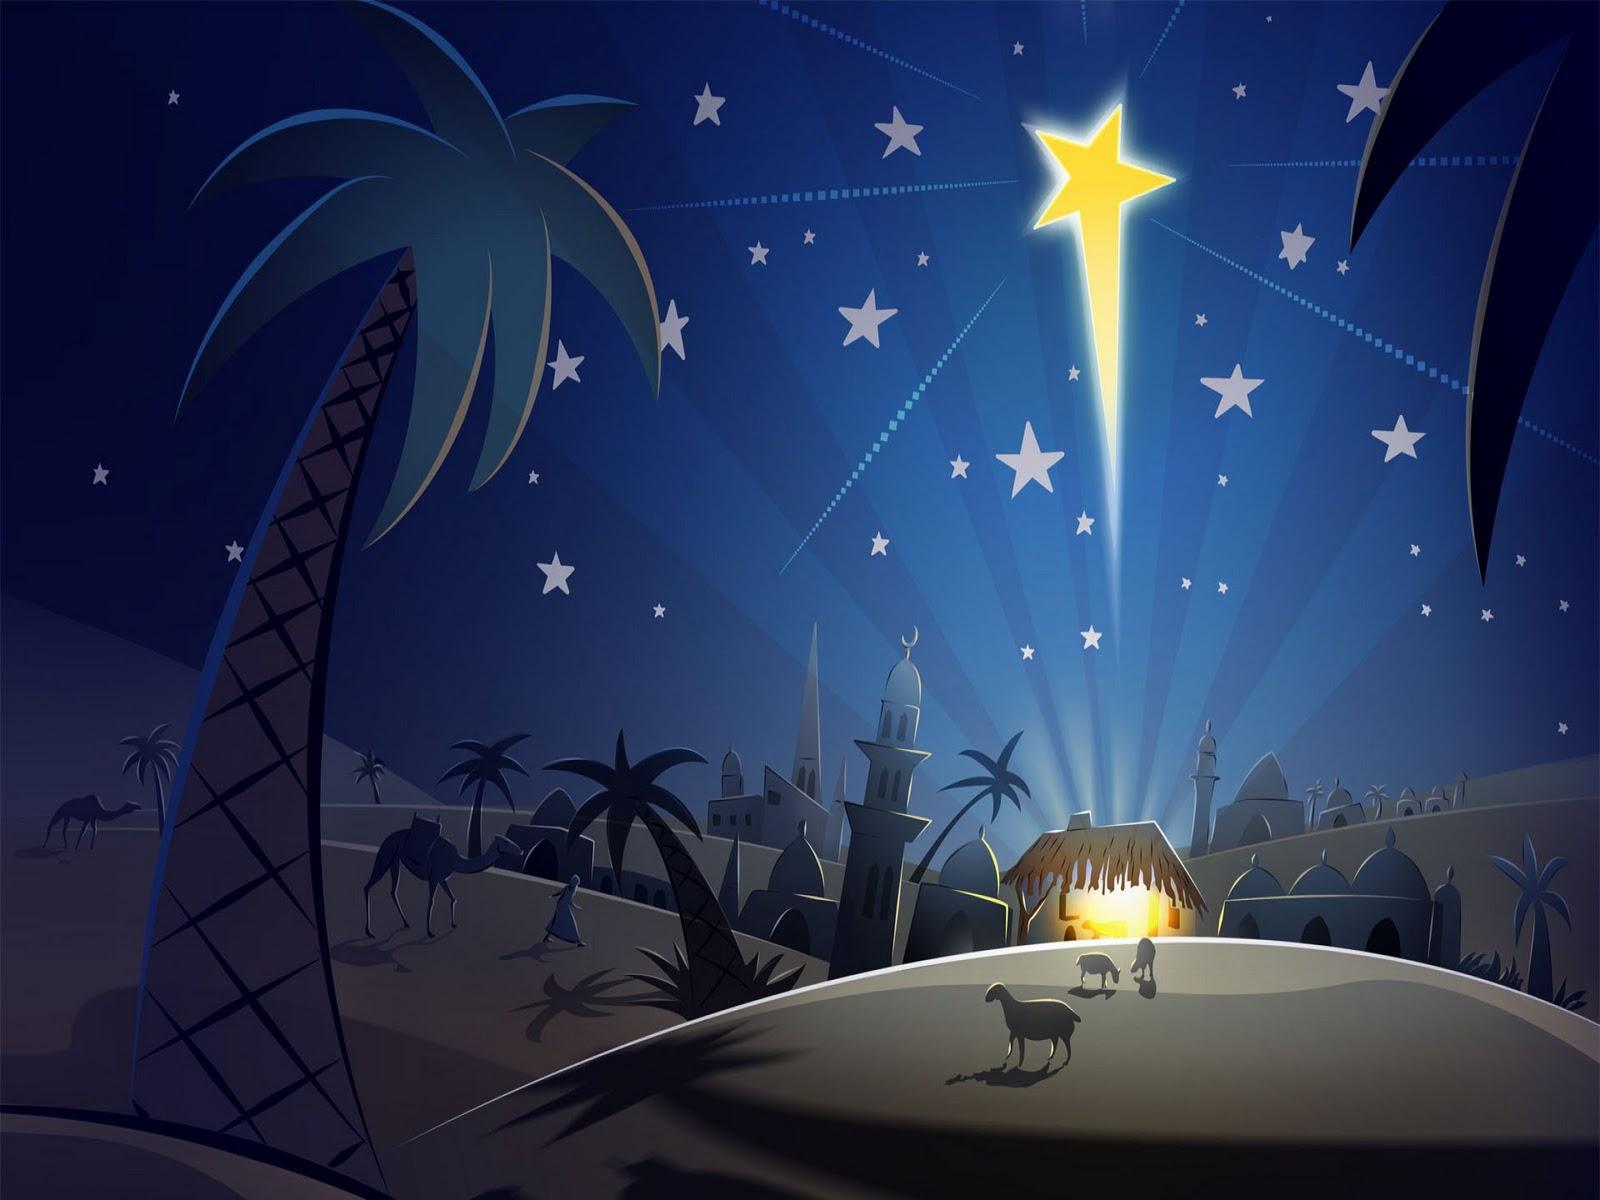 Follow-the-star_Let-this-serve-as-an-awakening